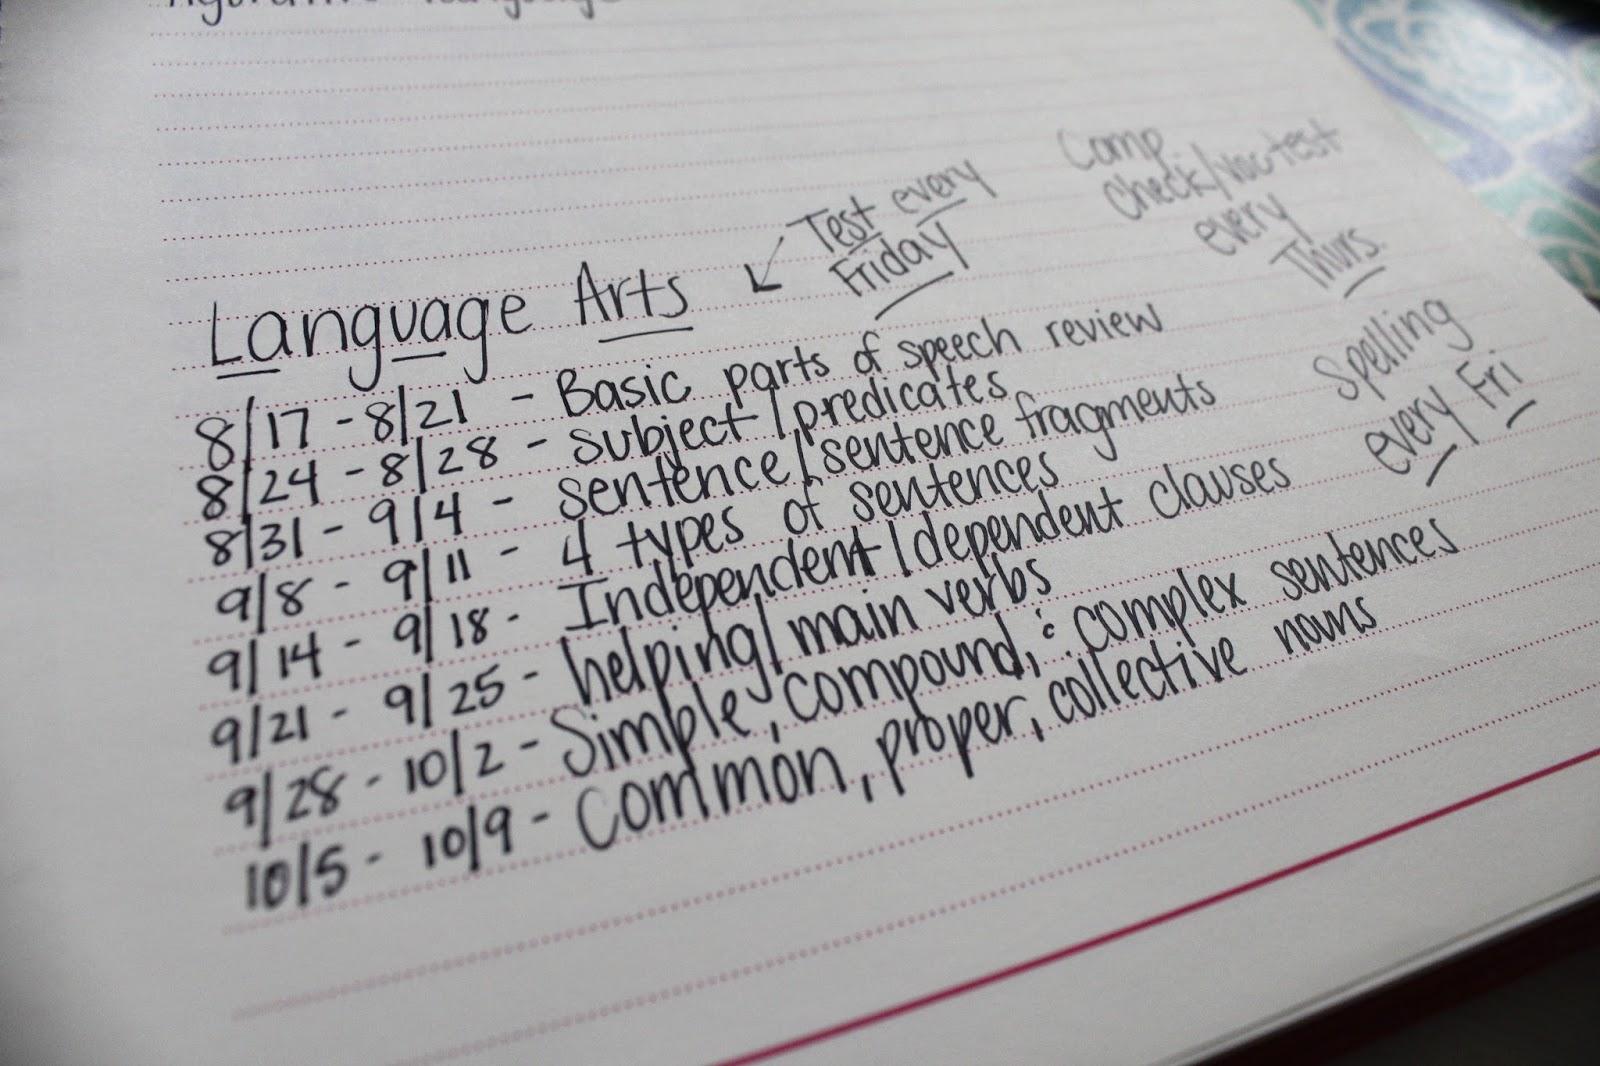 1st grading period pacing guide details life in fifth grade rh lifeinfifthgrade com 5th Grade Math Worksheets 5th Grade Grammar Worksheets